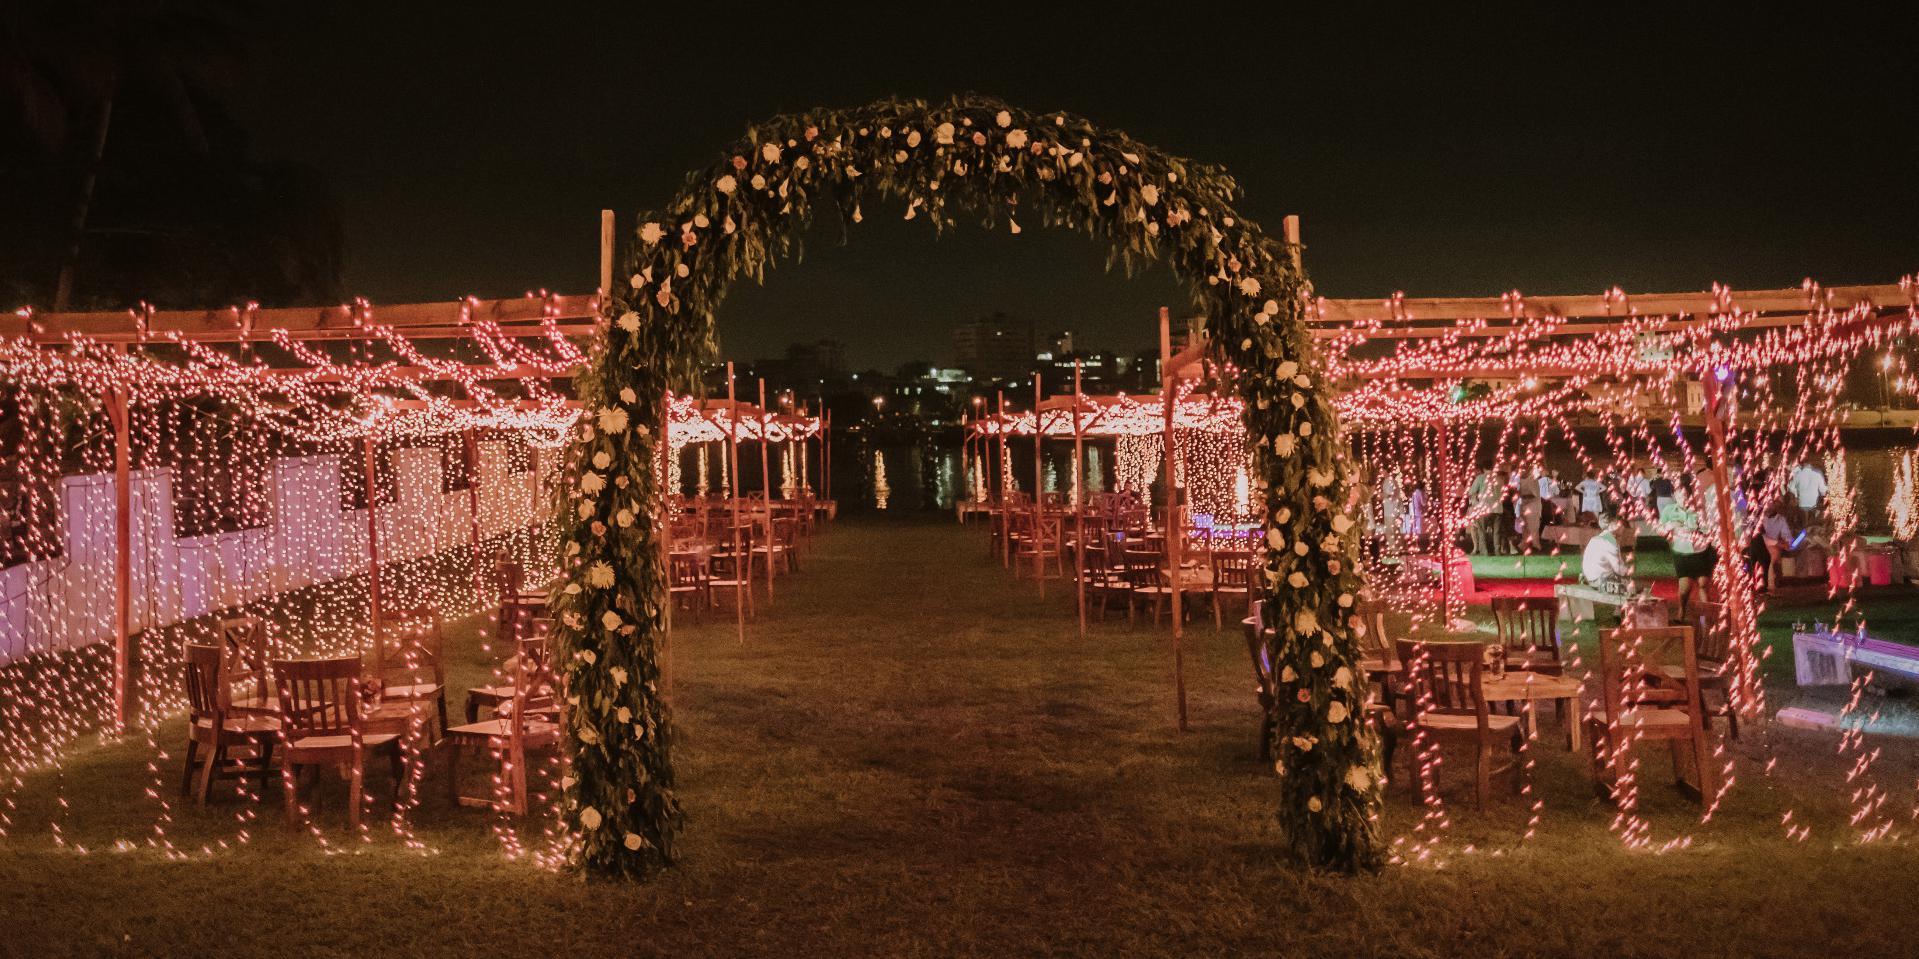 bodas-sin-clasificar-sin-tema-cuba-29501.jpg